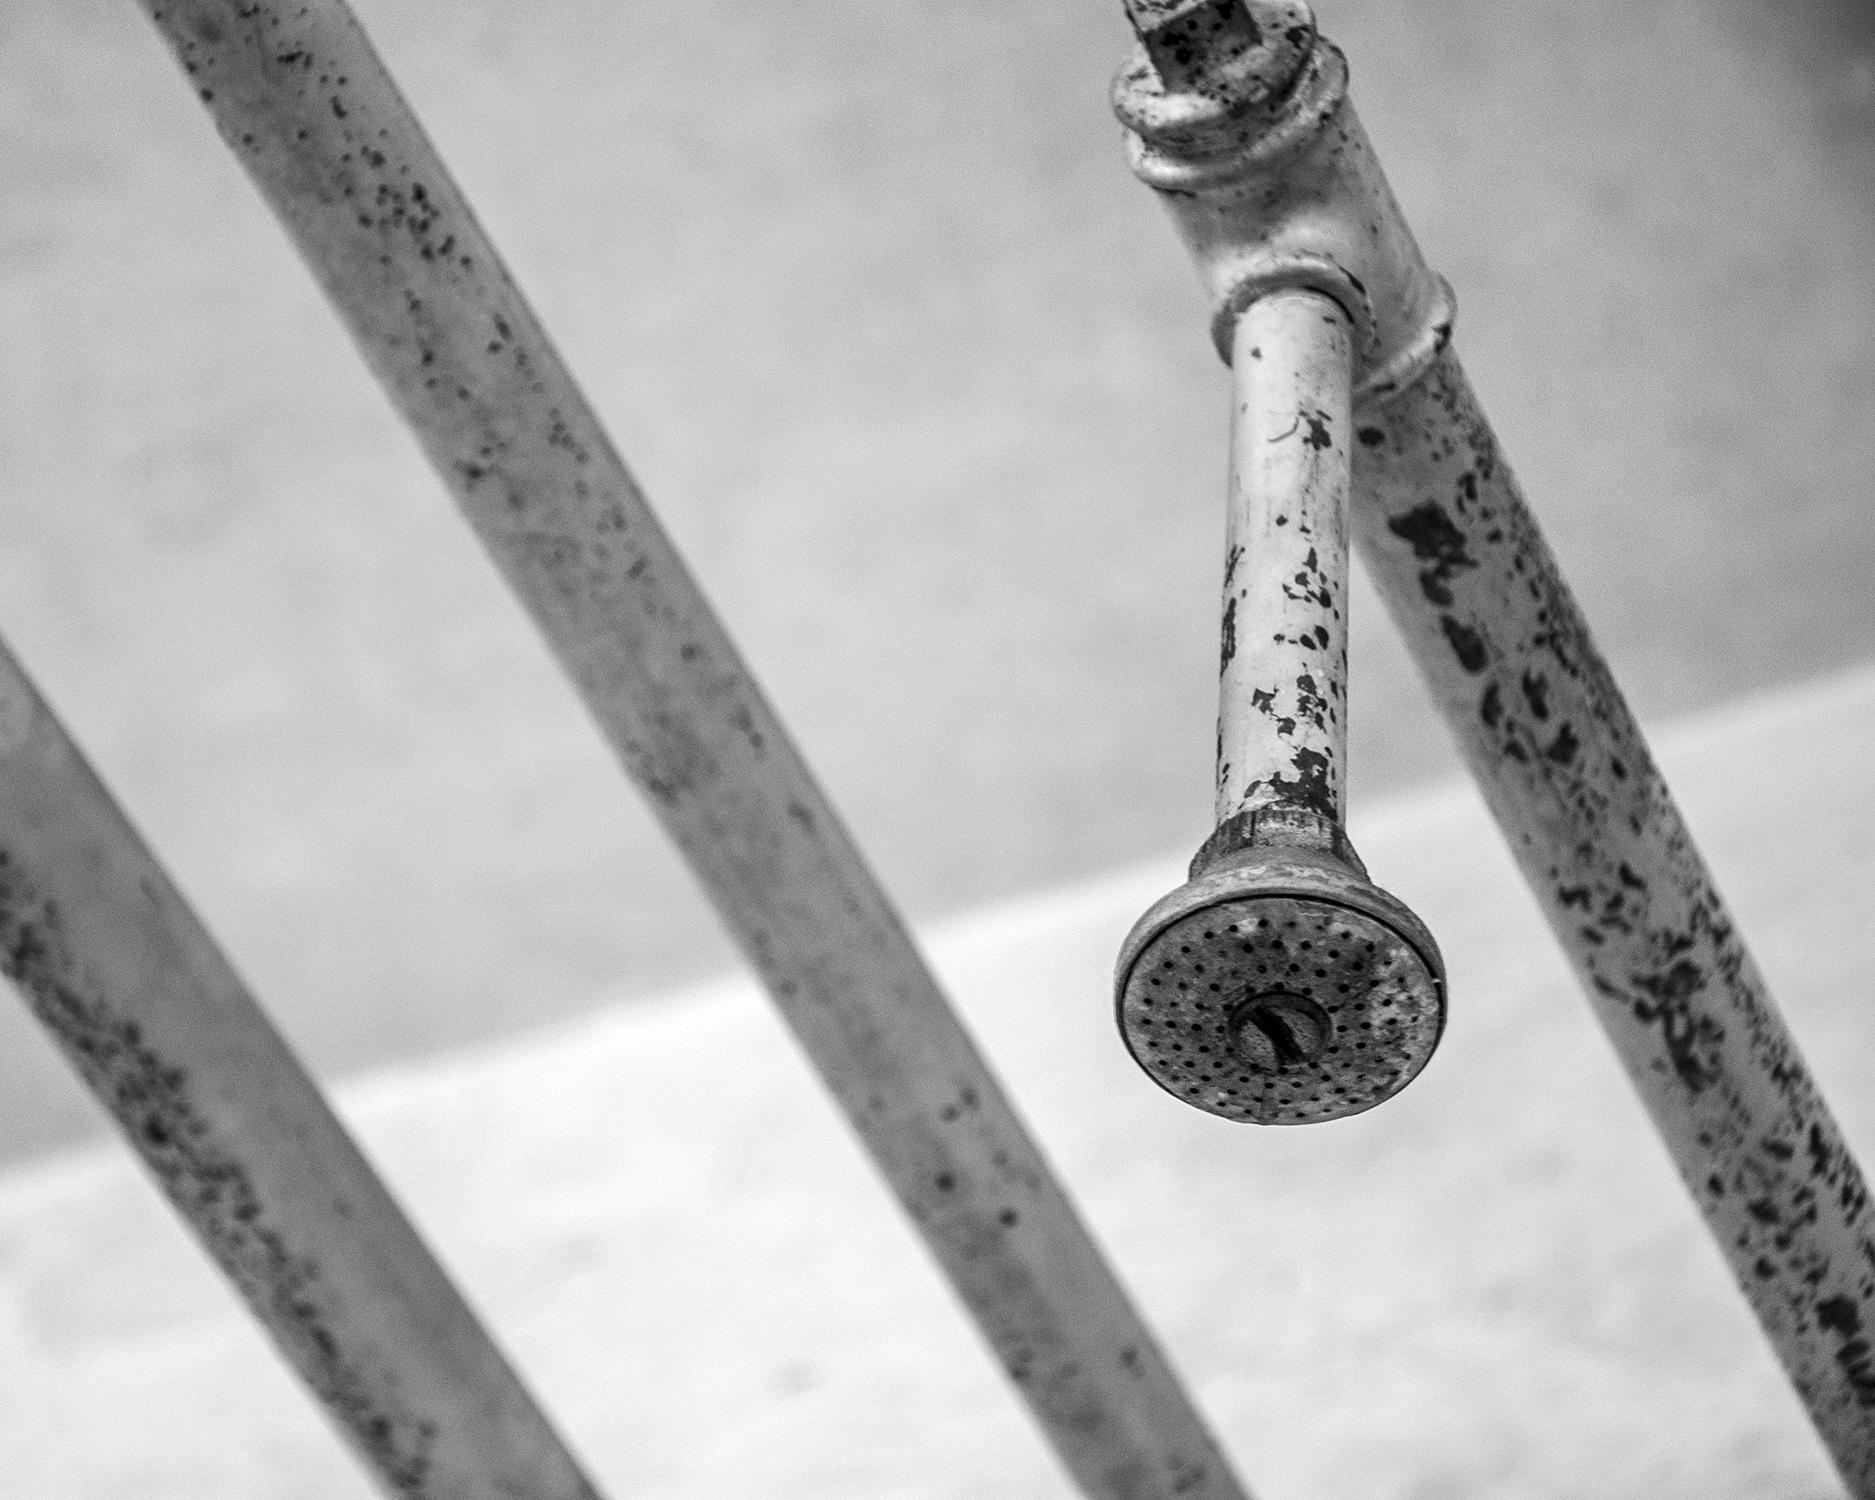 docce campo concentramento Mauthausen-7930.jpg